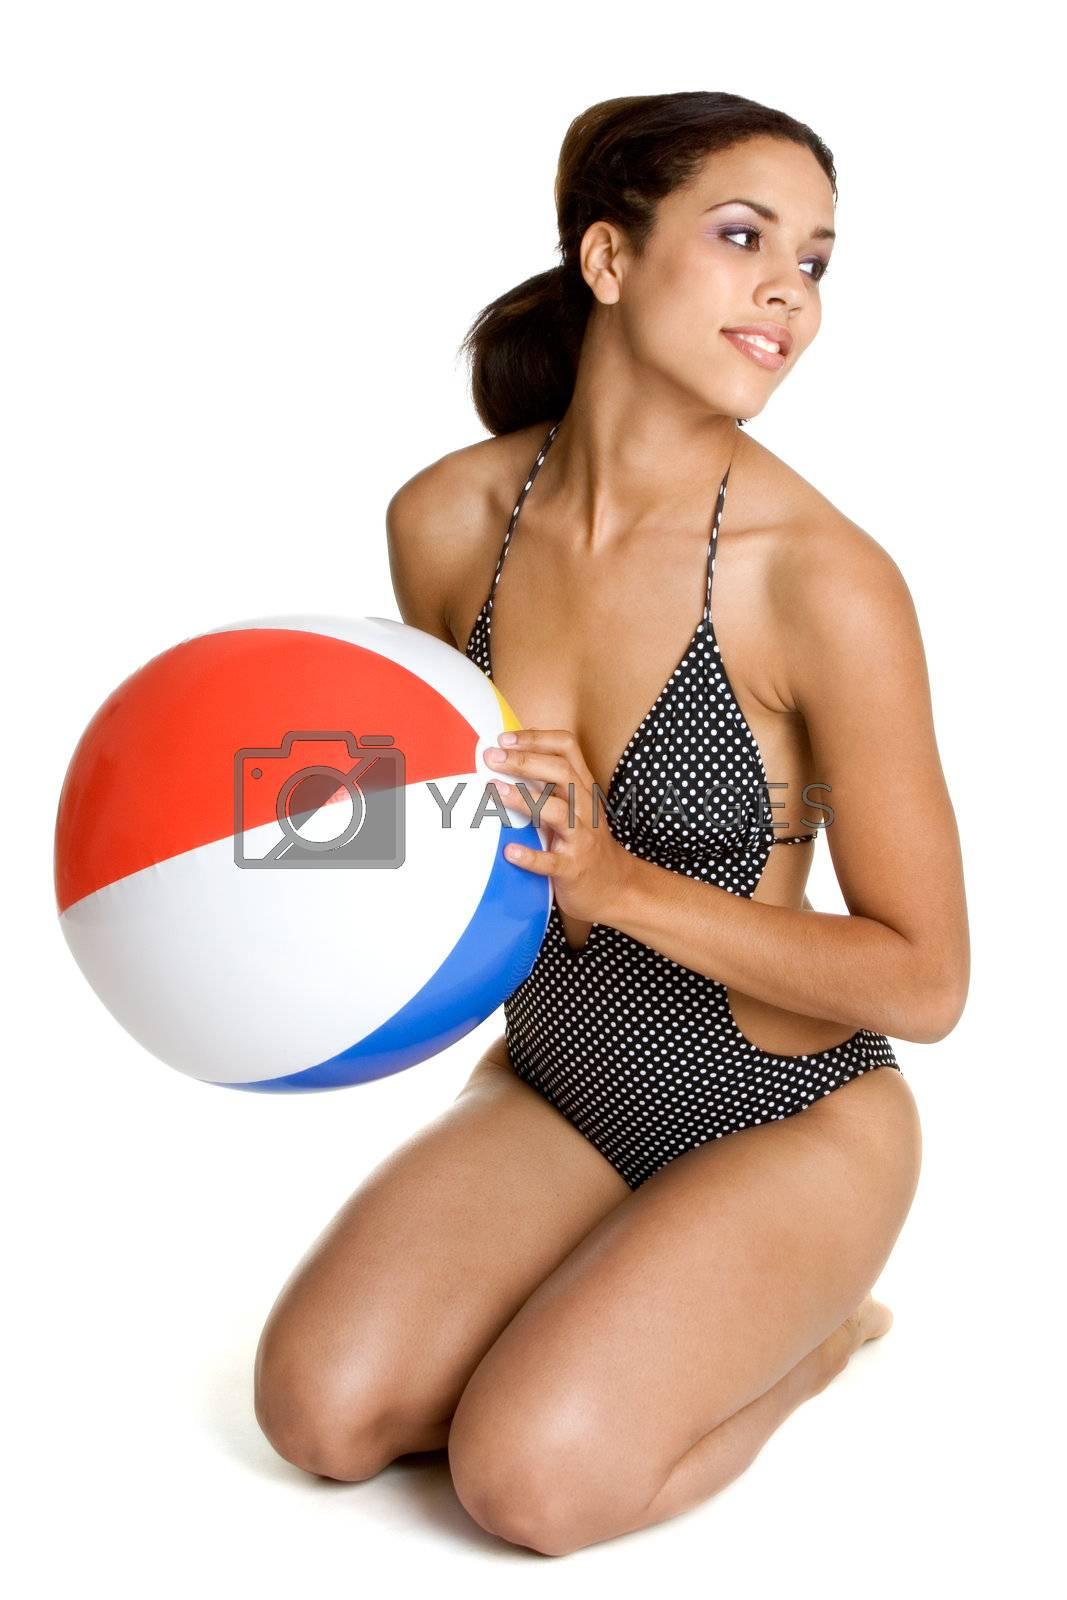 Isolated girl holding beach ball